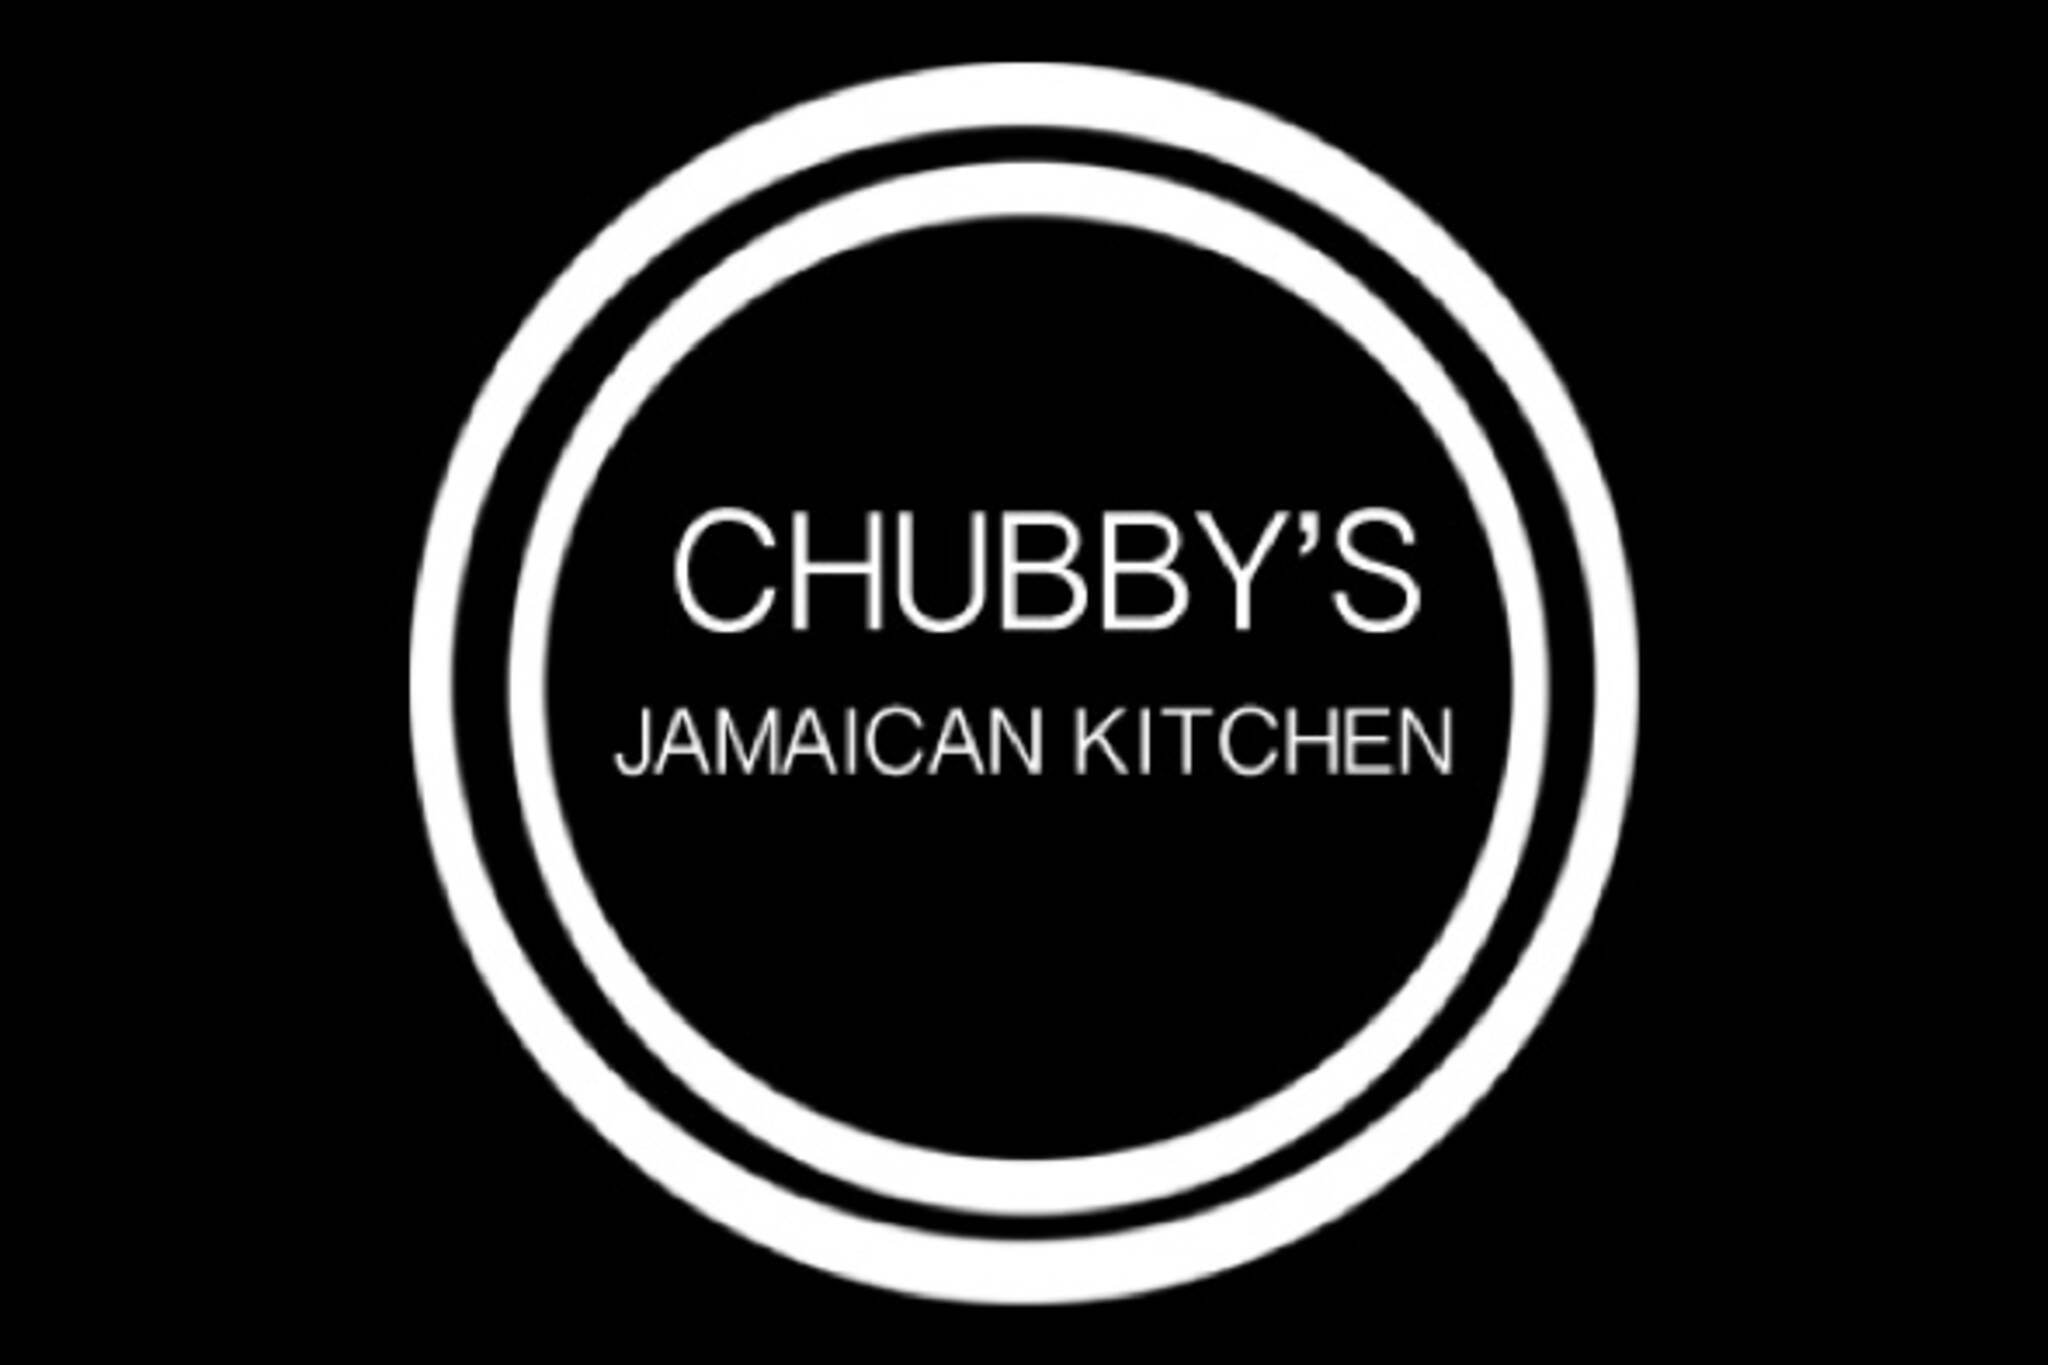 gusto 101 owners opening jerk chicken restaurant. Black Bedroom Furniture Sets. Home Design Ideas